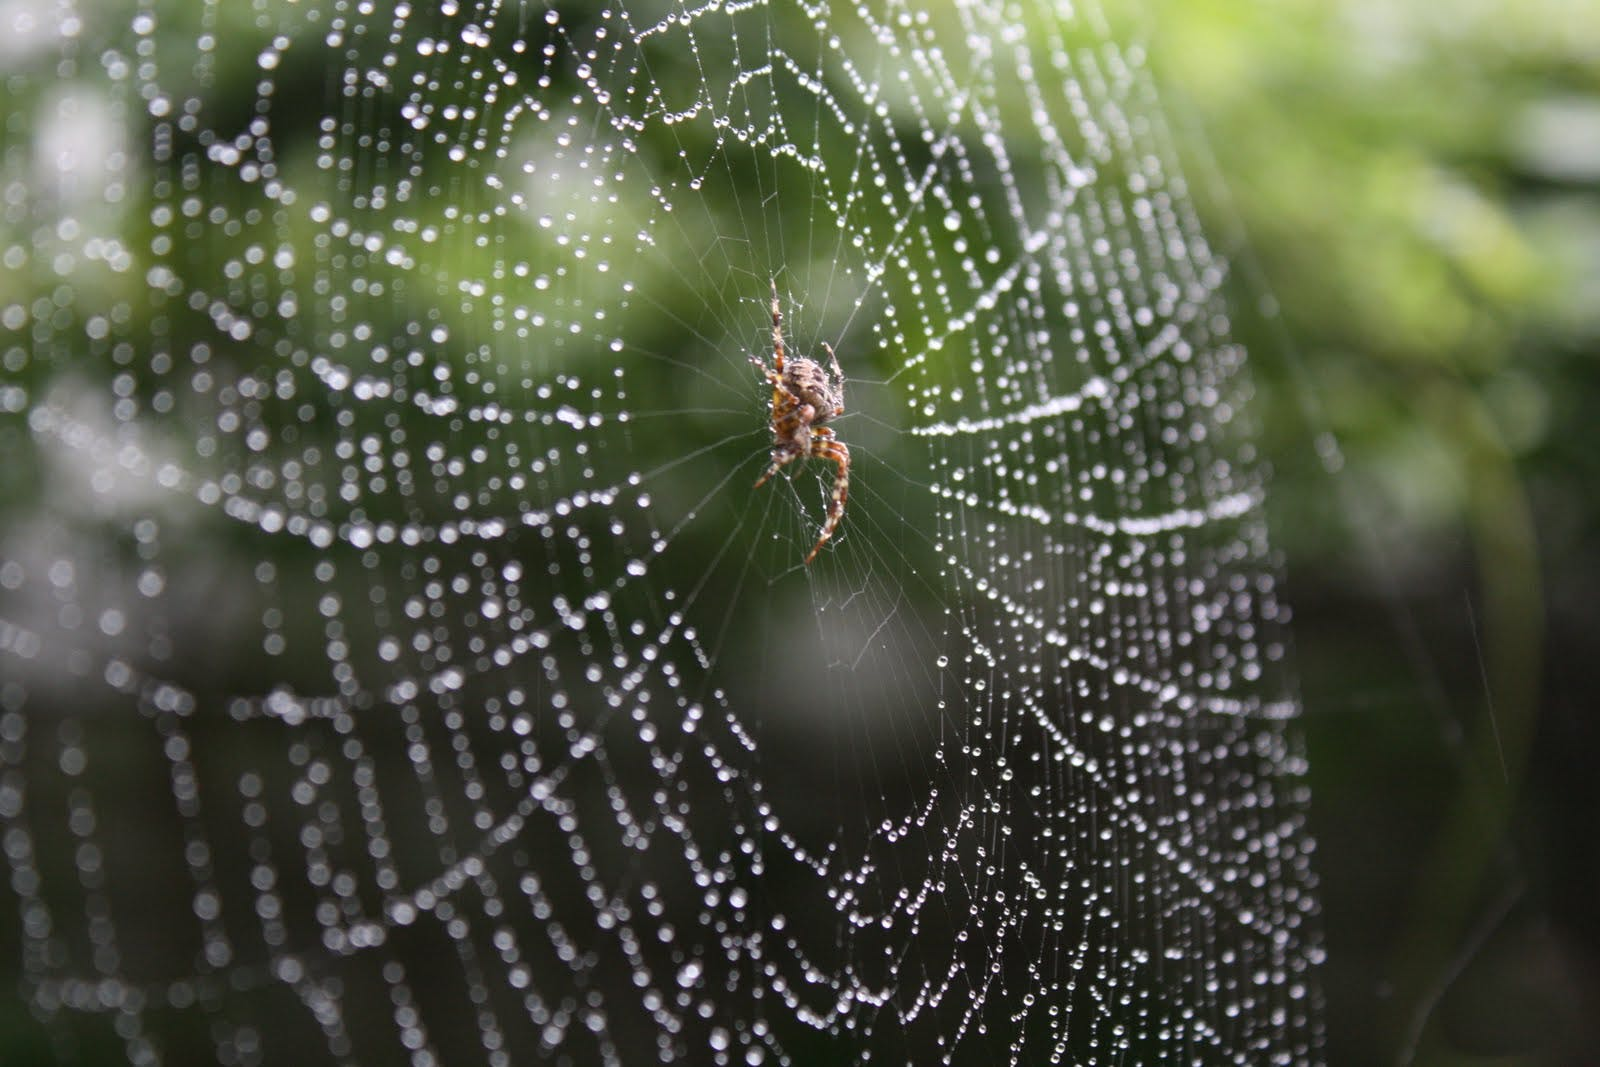 Free stock photo of autumn, dew drops, garden, spider